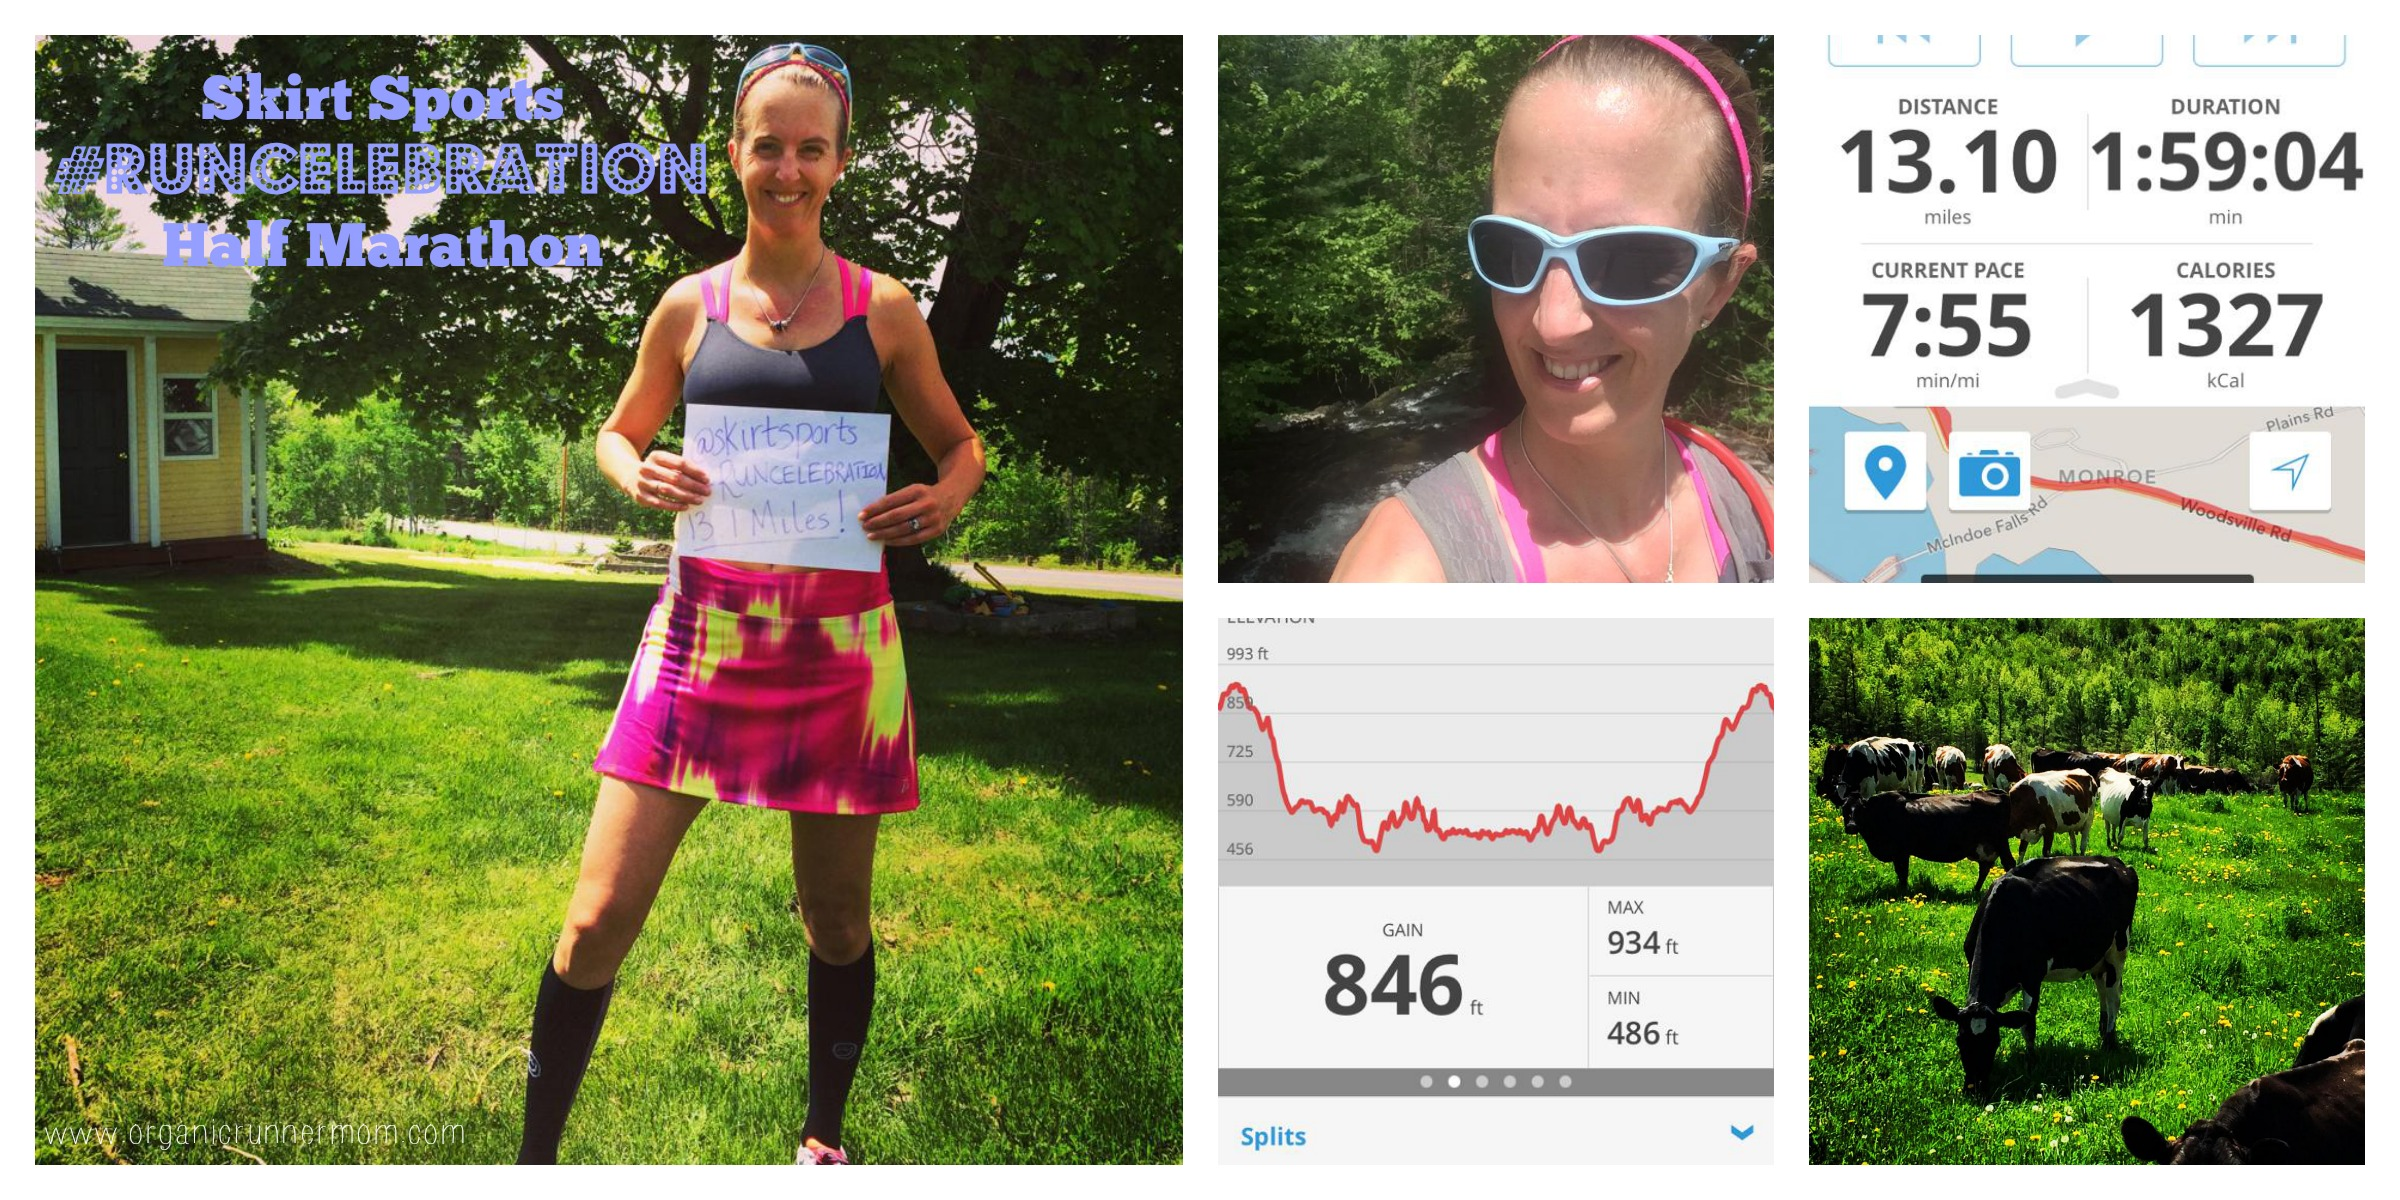 Skirt Sports #runcelebration Half Marathon